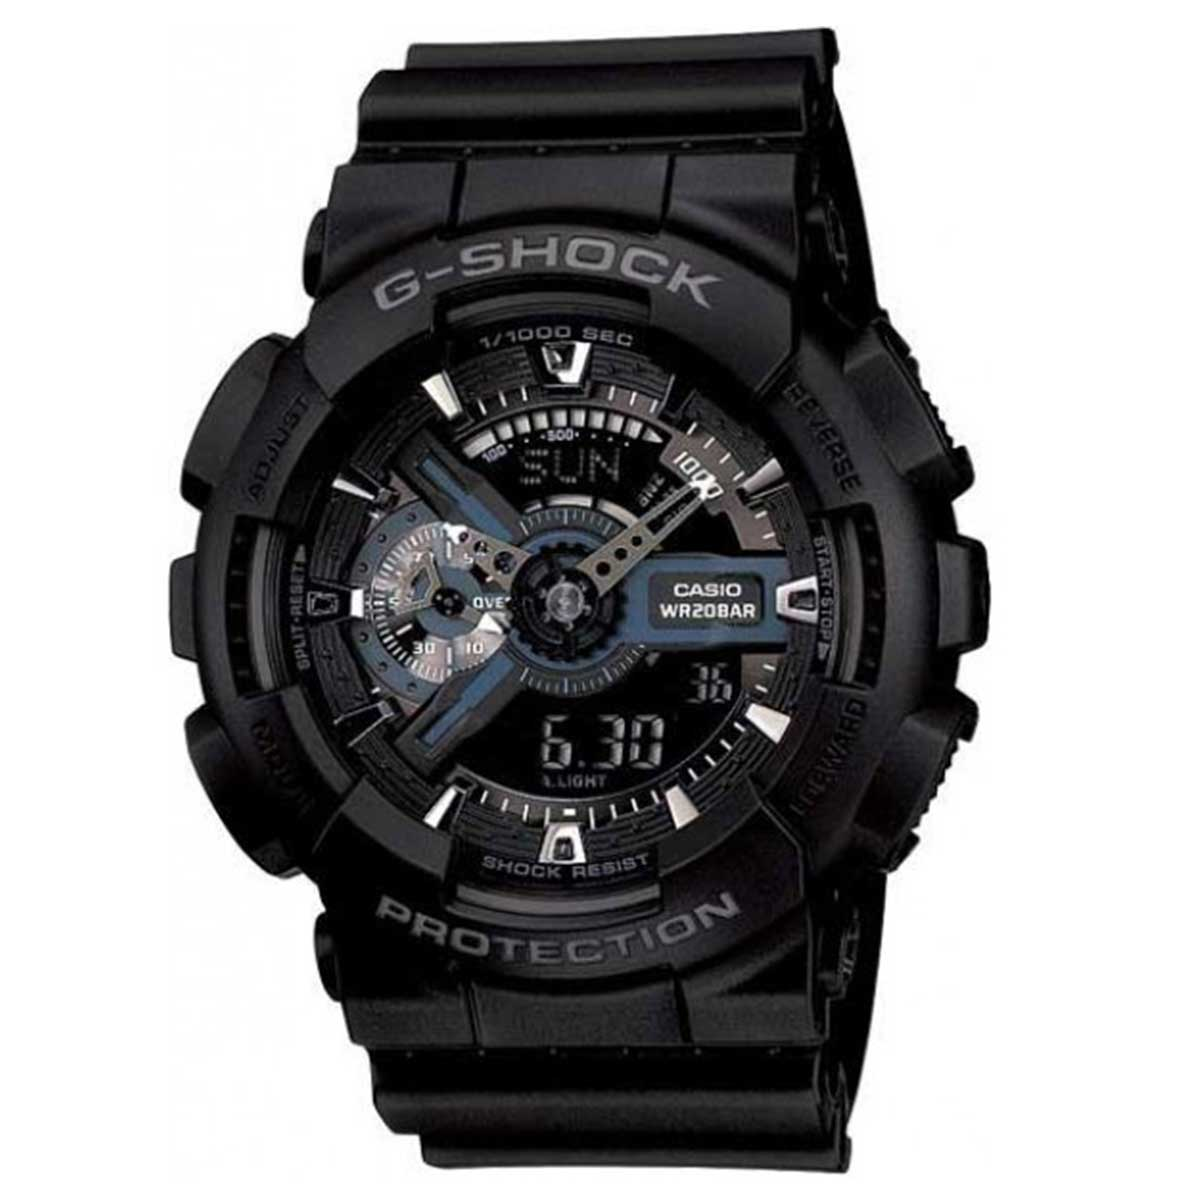 Relógio de Pulso Casio G-ShocK Modelo GA-110-1BDR